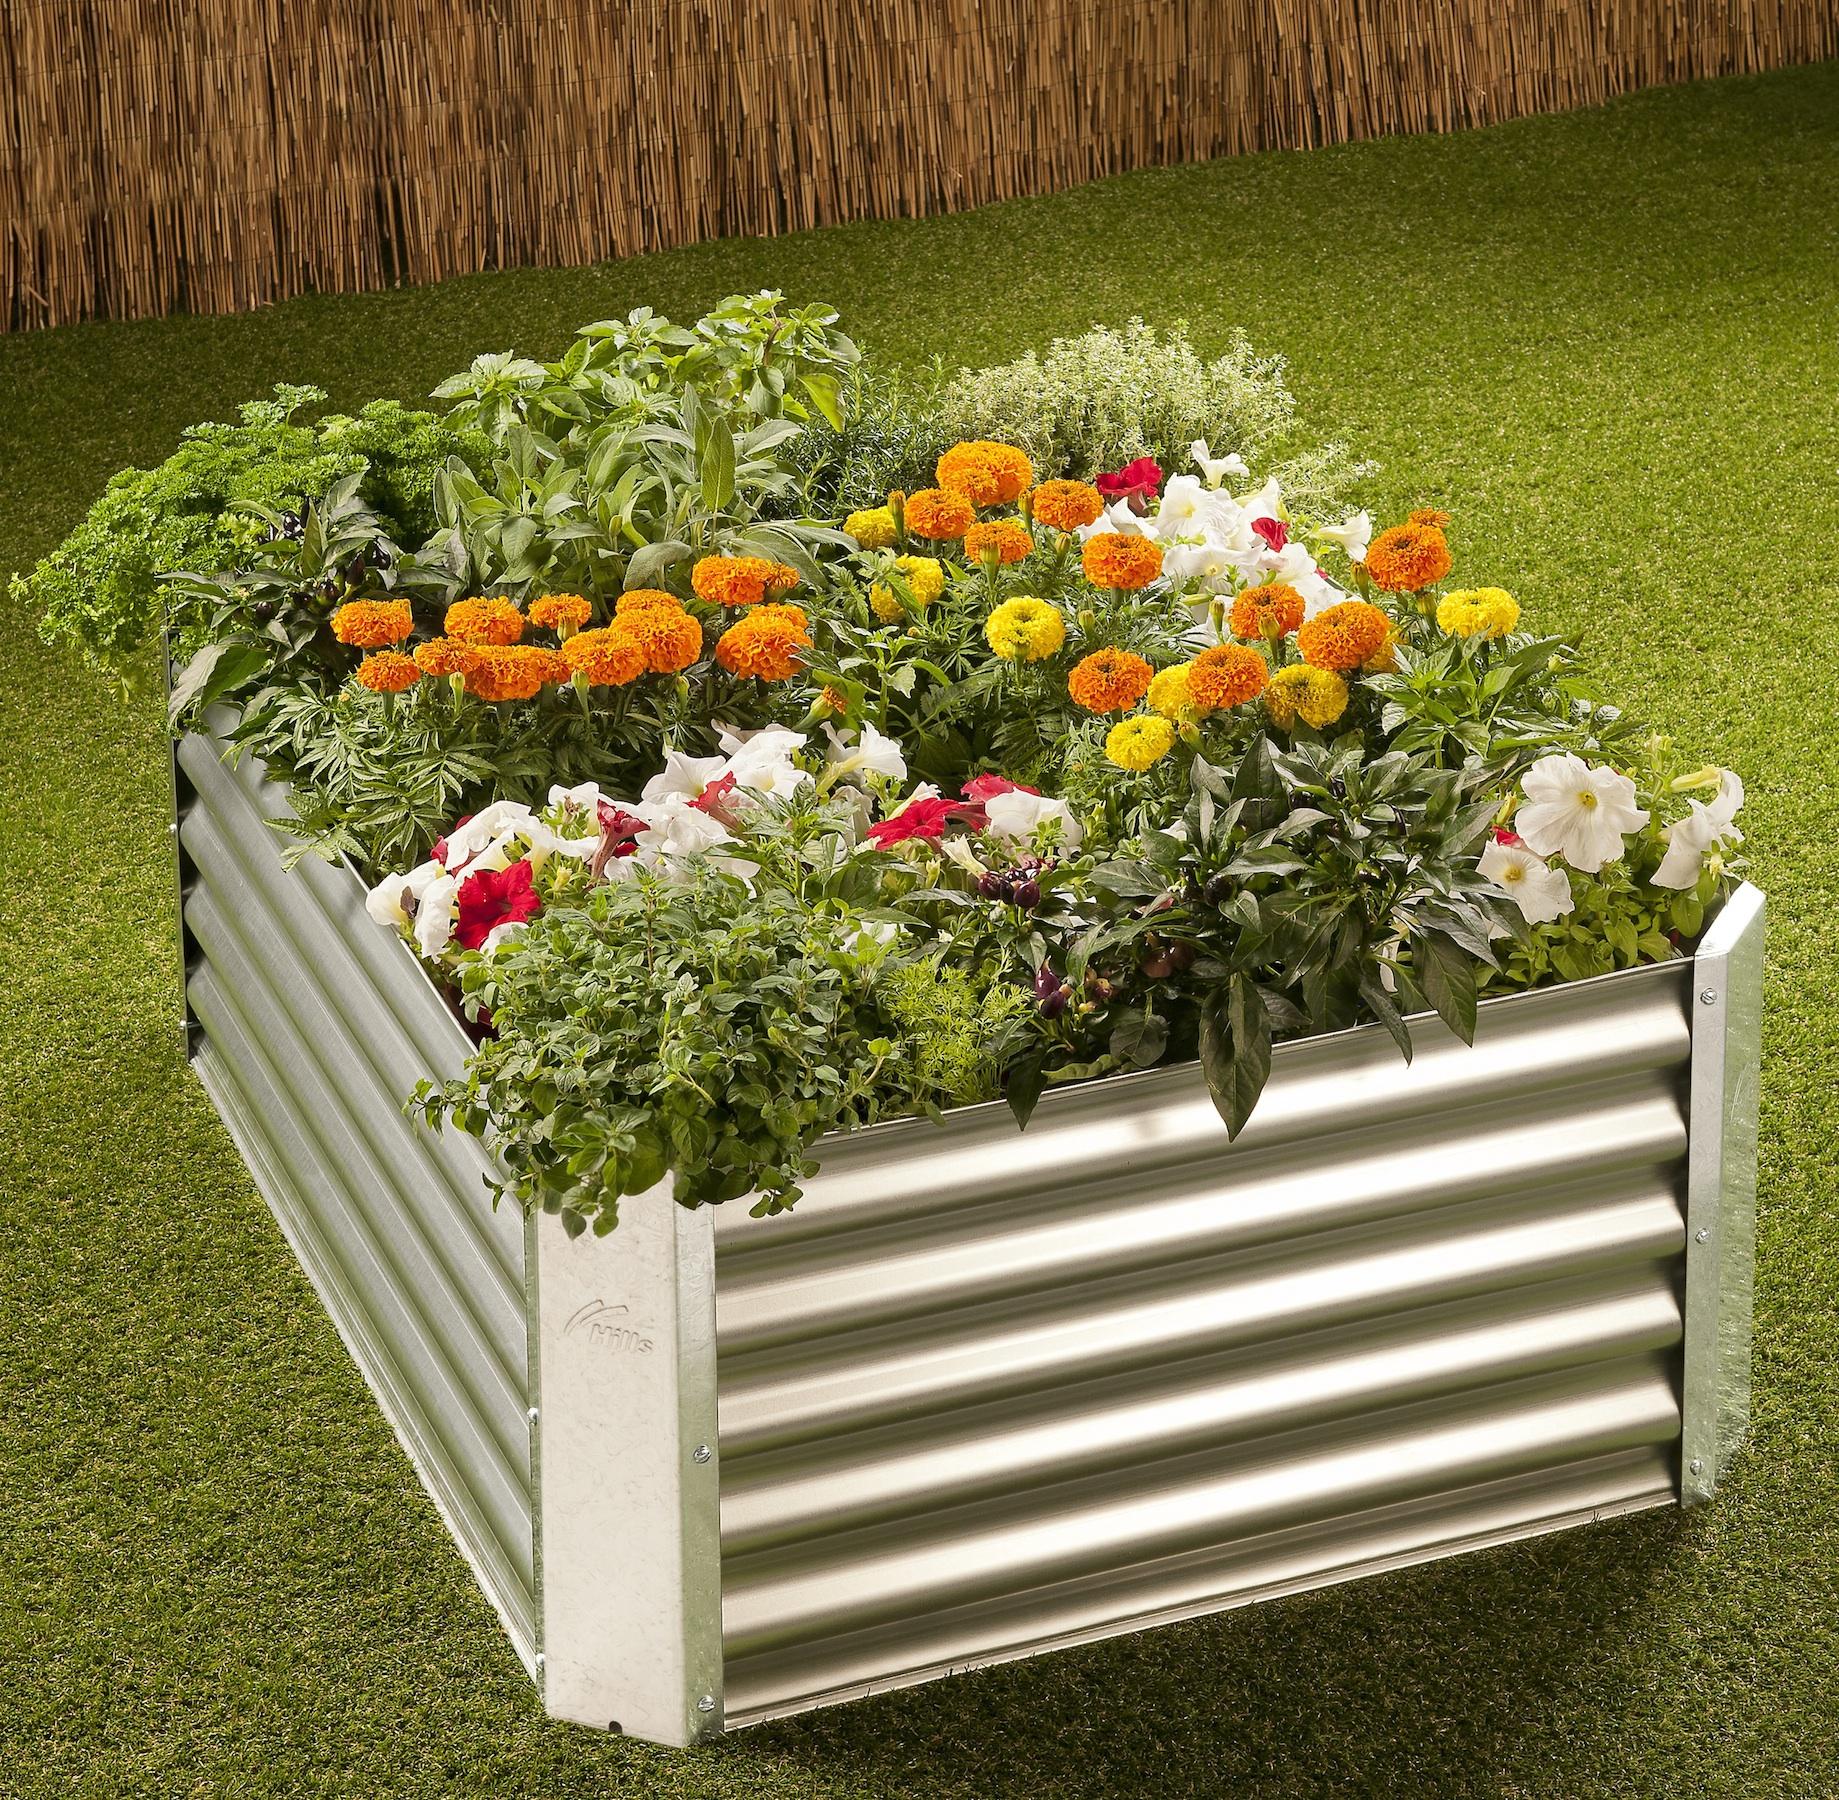 Hills Adda Instant Garden : Adda garden hills clotheslines retractable rotary